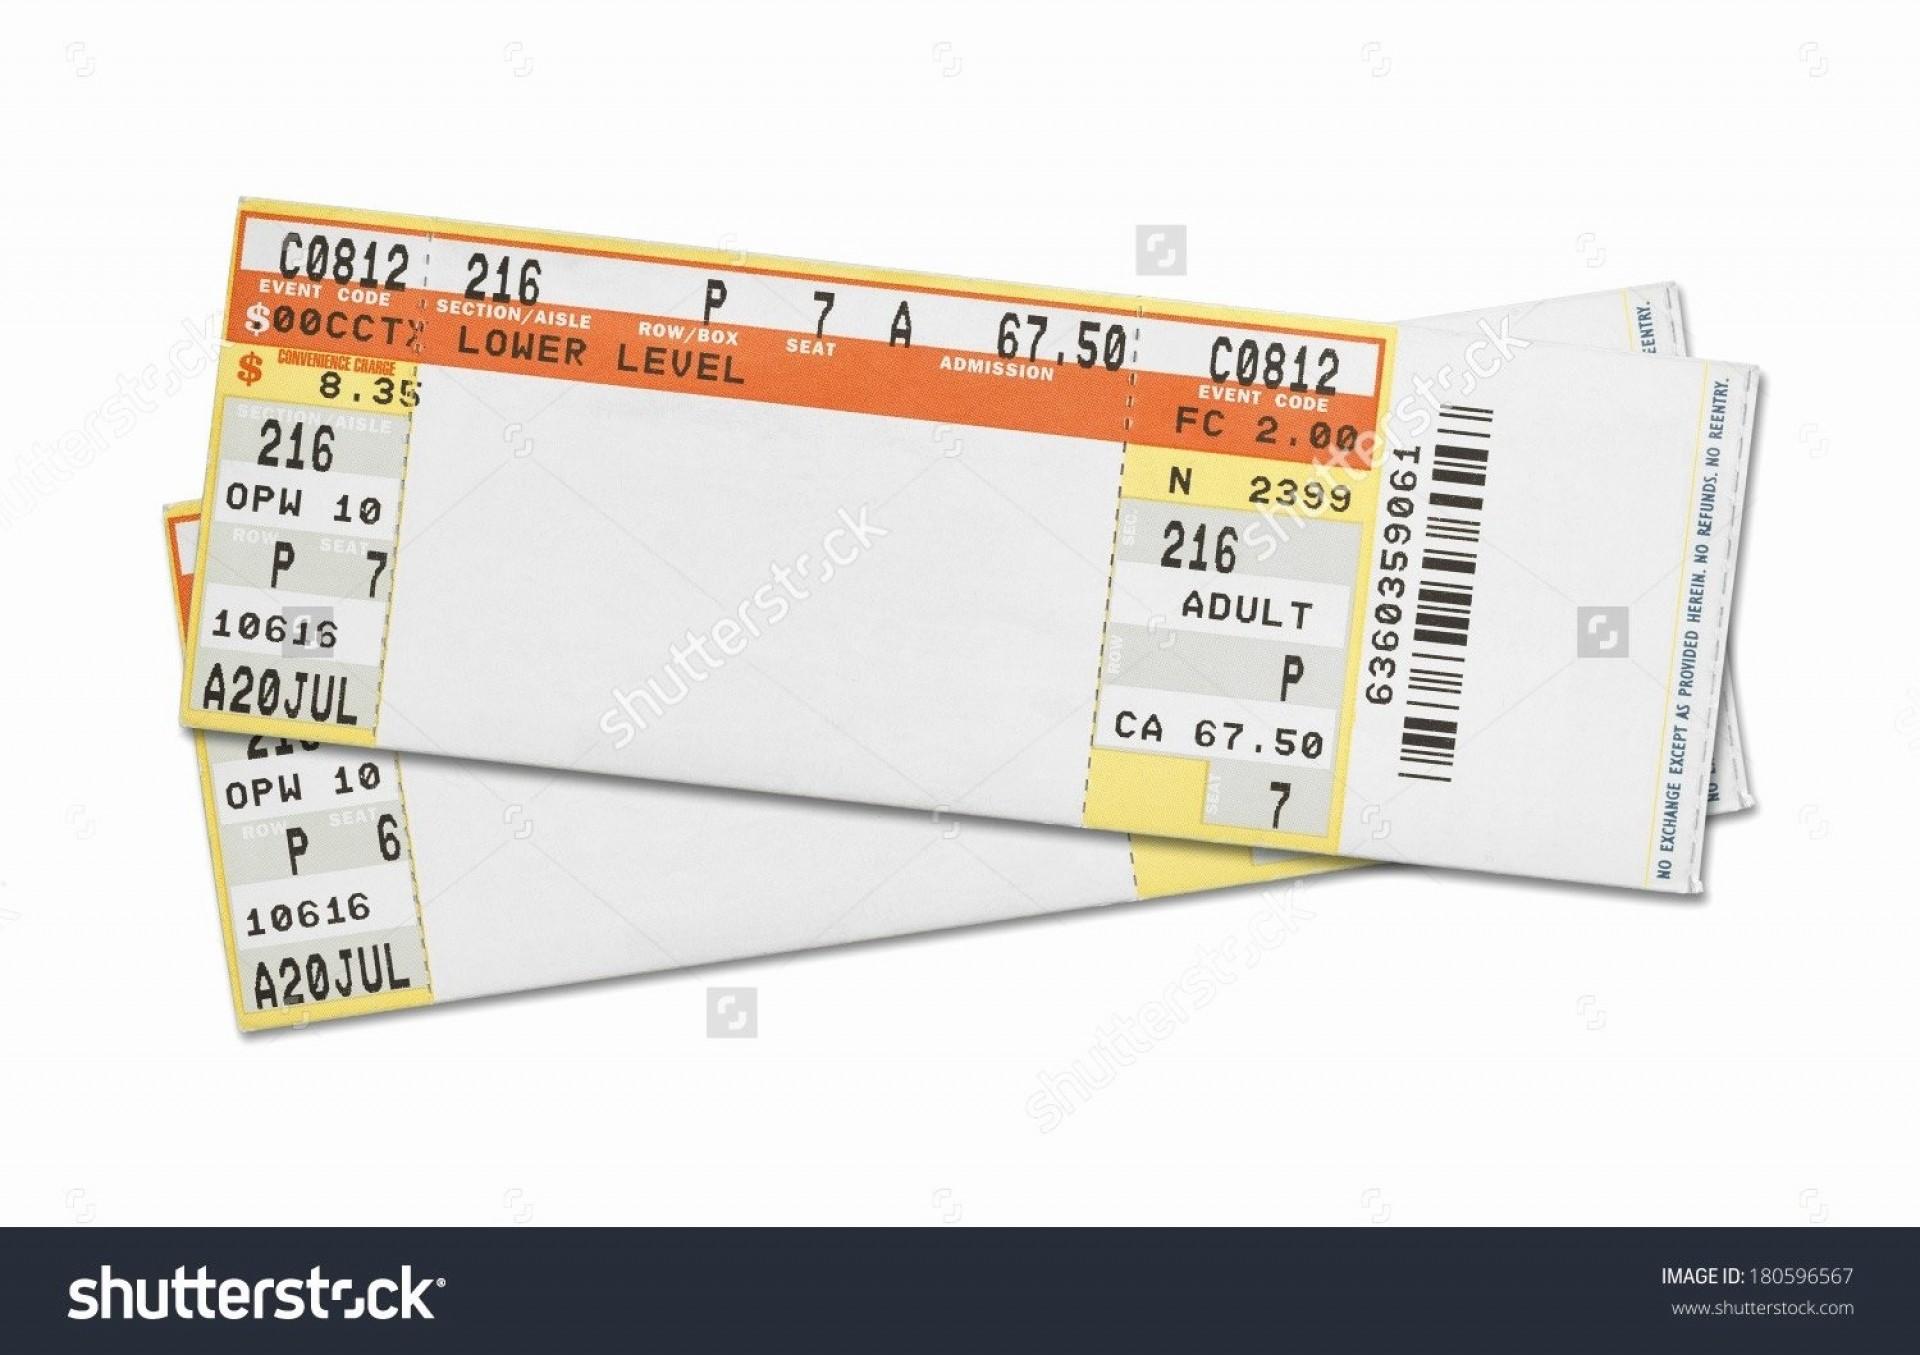 003 Astounding Free Editable Concert Ticket Template High Definition  Psd Word1920